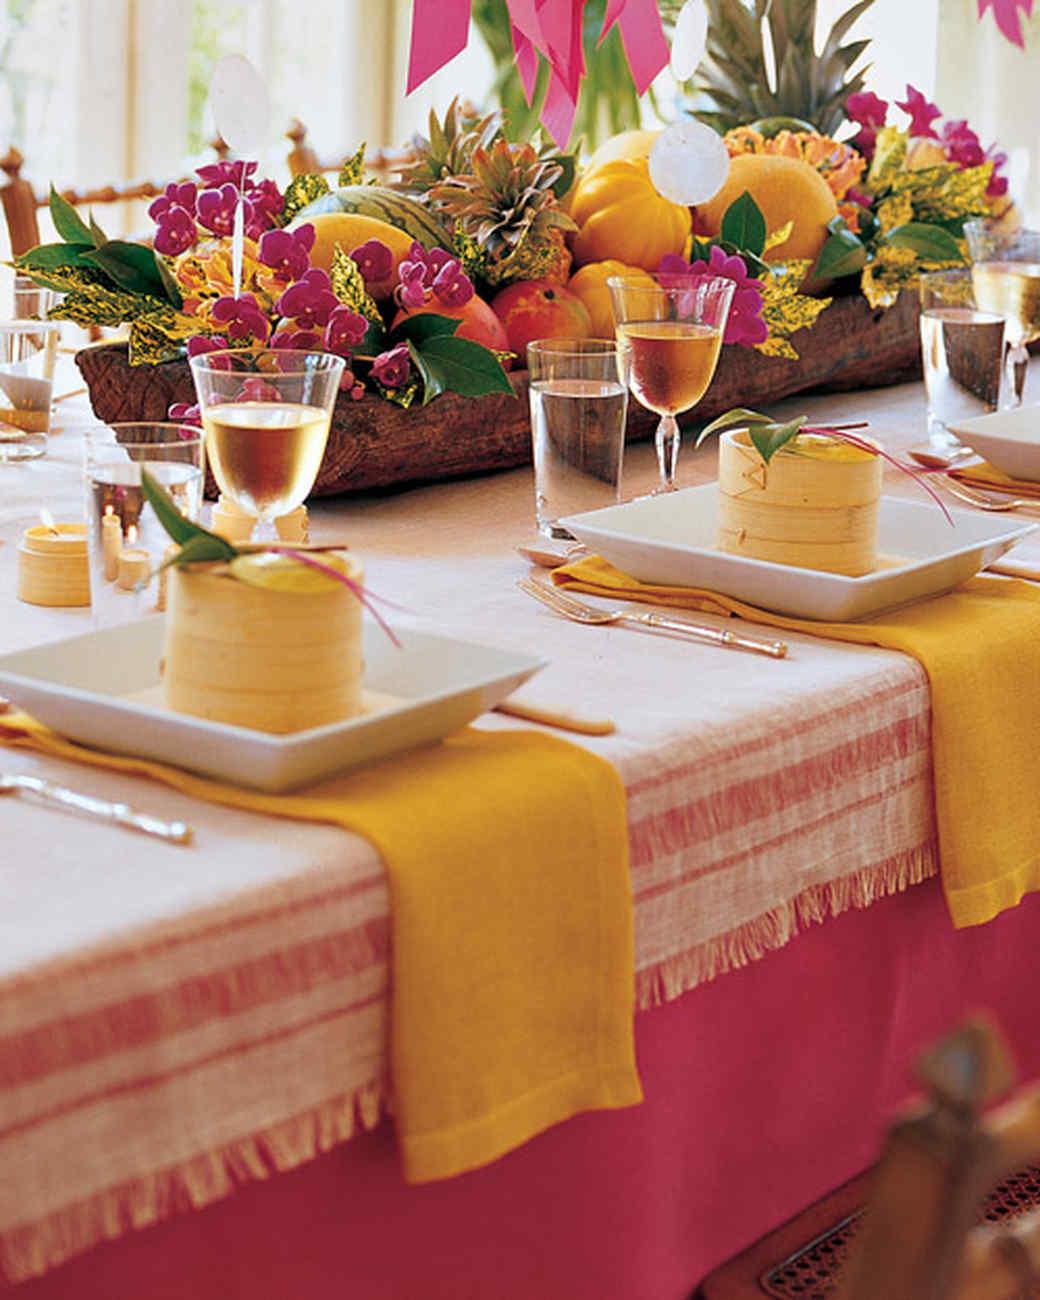 Tropical Fruit Centerpiece & Summer Centerpieces for Entertaining   Martha Stewart